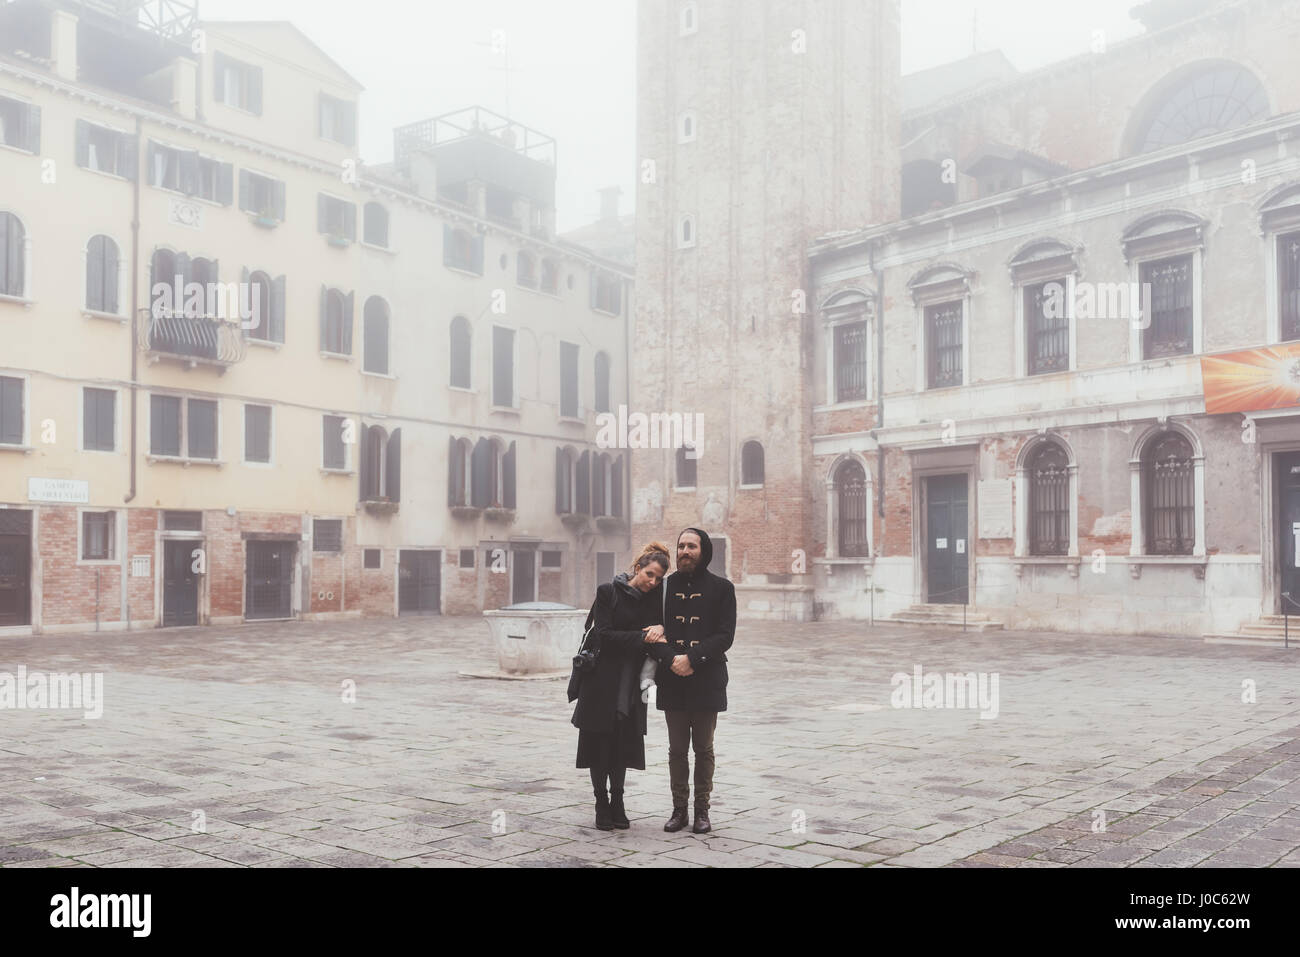 Retrato de pareja en misty square, Venecia, Italia Imagen De Stock